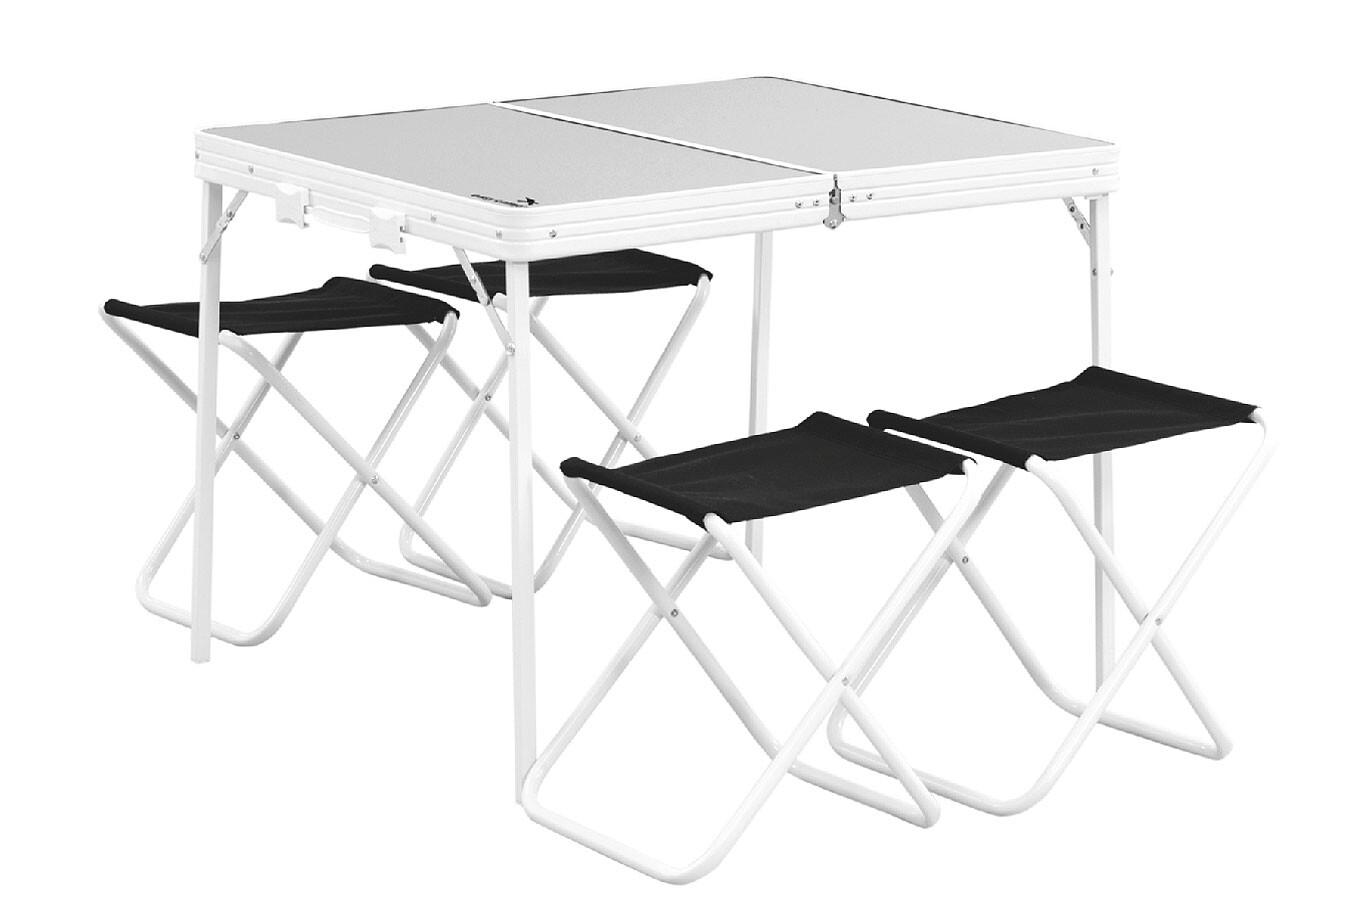 Easy Camp Provence  campingtisch~tisch~garten tisch~koffer tisch~klapptisch~Campingmöbel~Camping